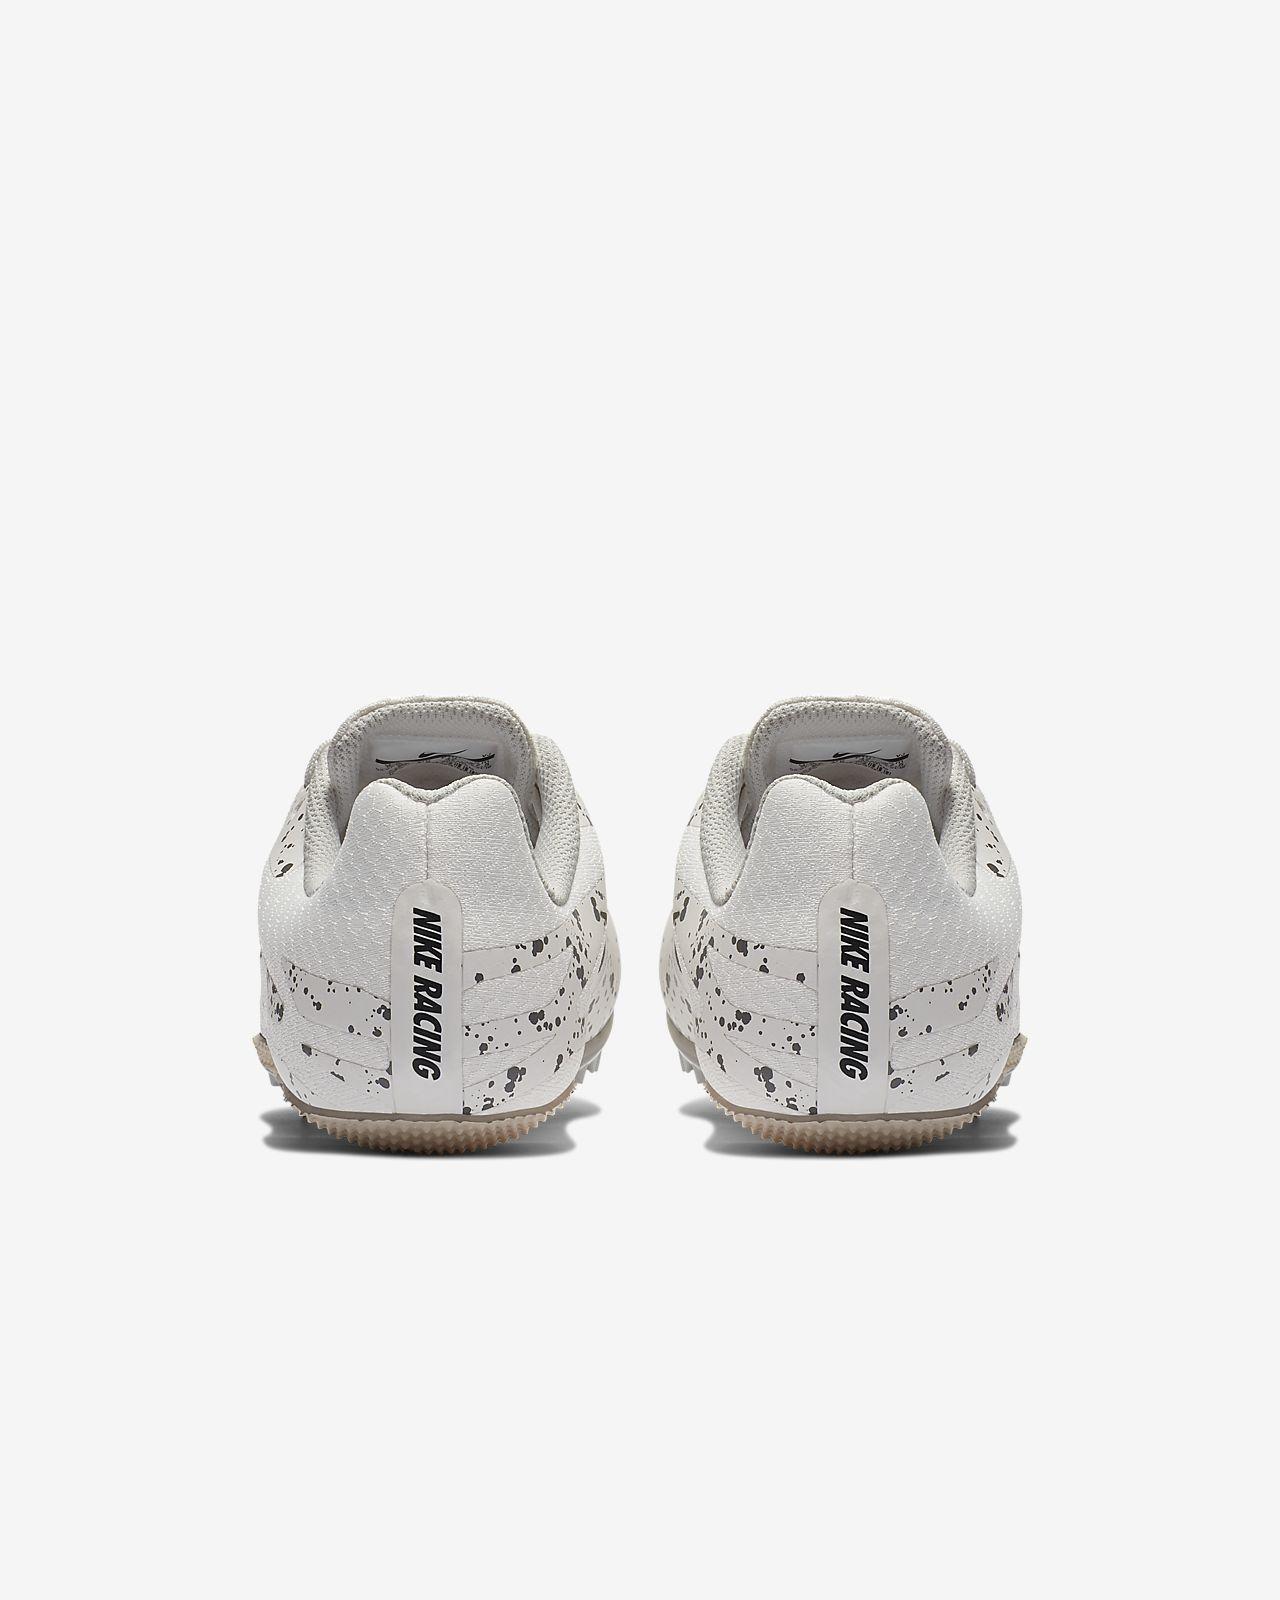 new product c7dec ddd3f ... Chaussure de course à pointes mixte Nike Zoom Rival S 9